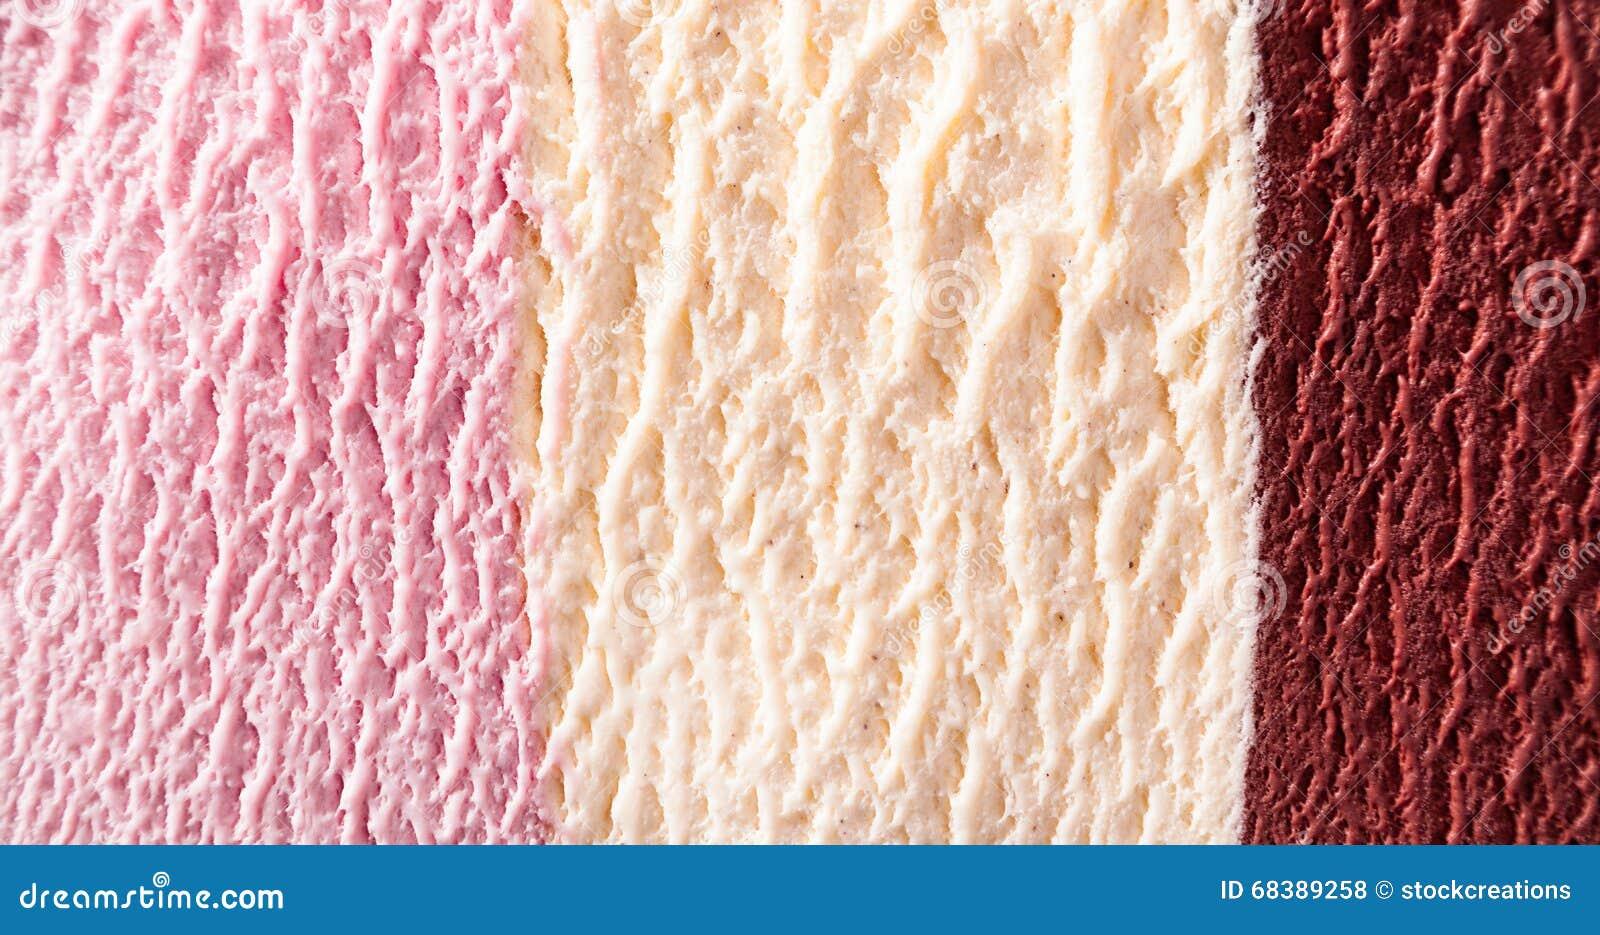 Delicious Strawberry, Fudge And Vanilla Ice Cream Stock Photo - Image ...